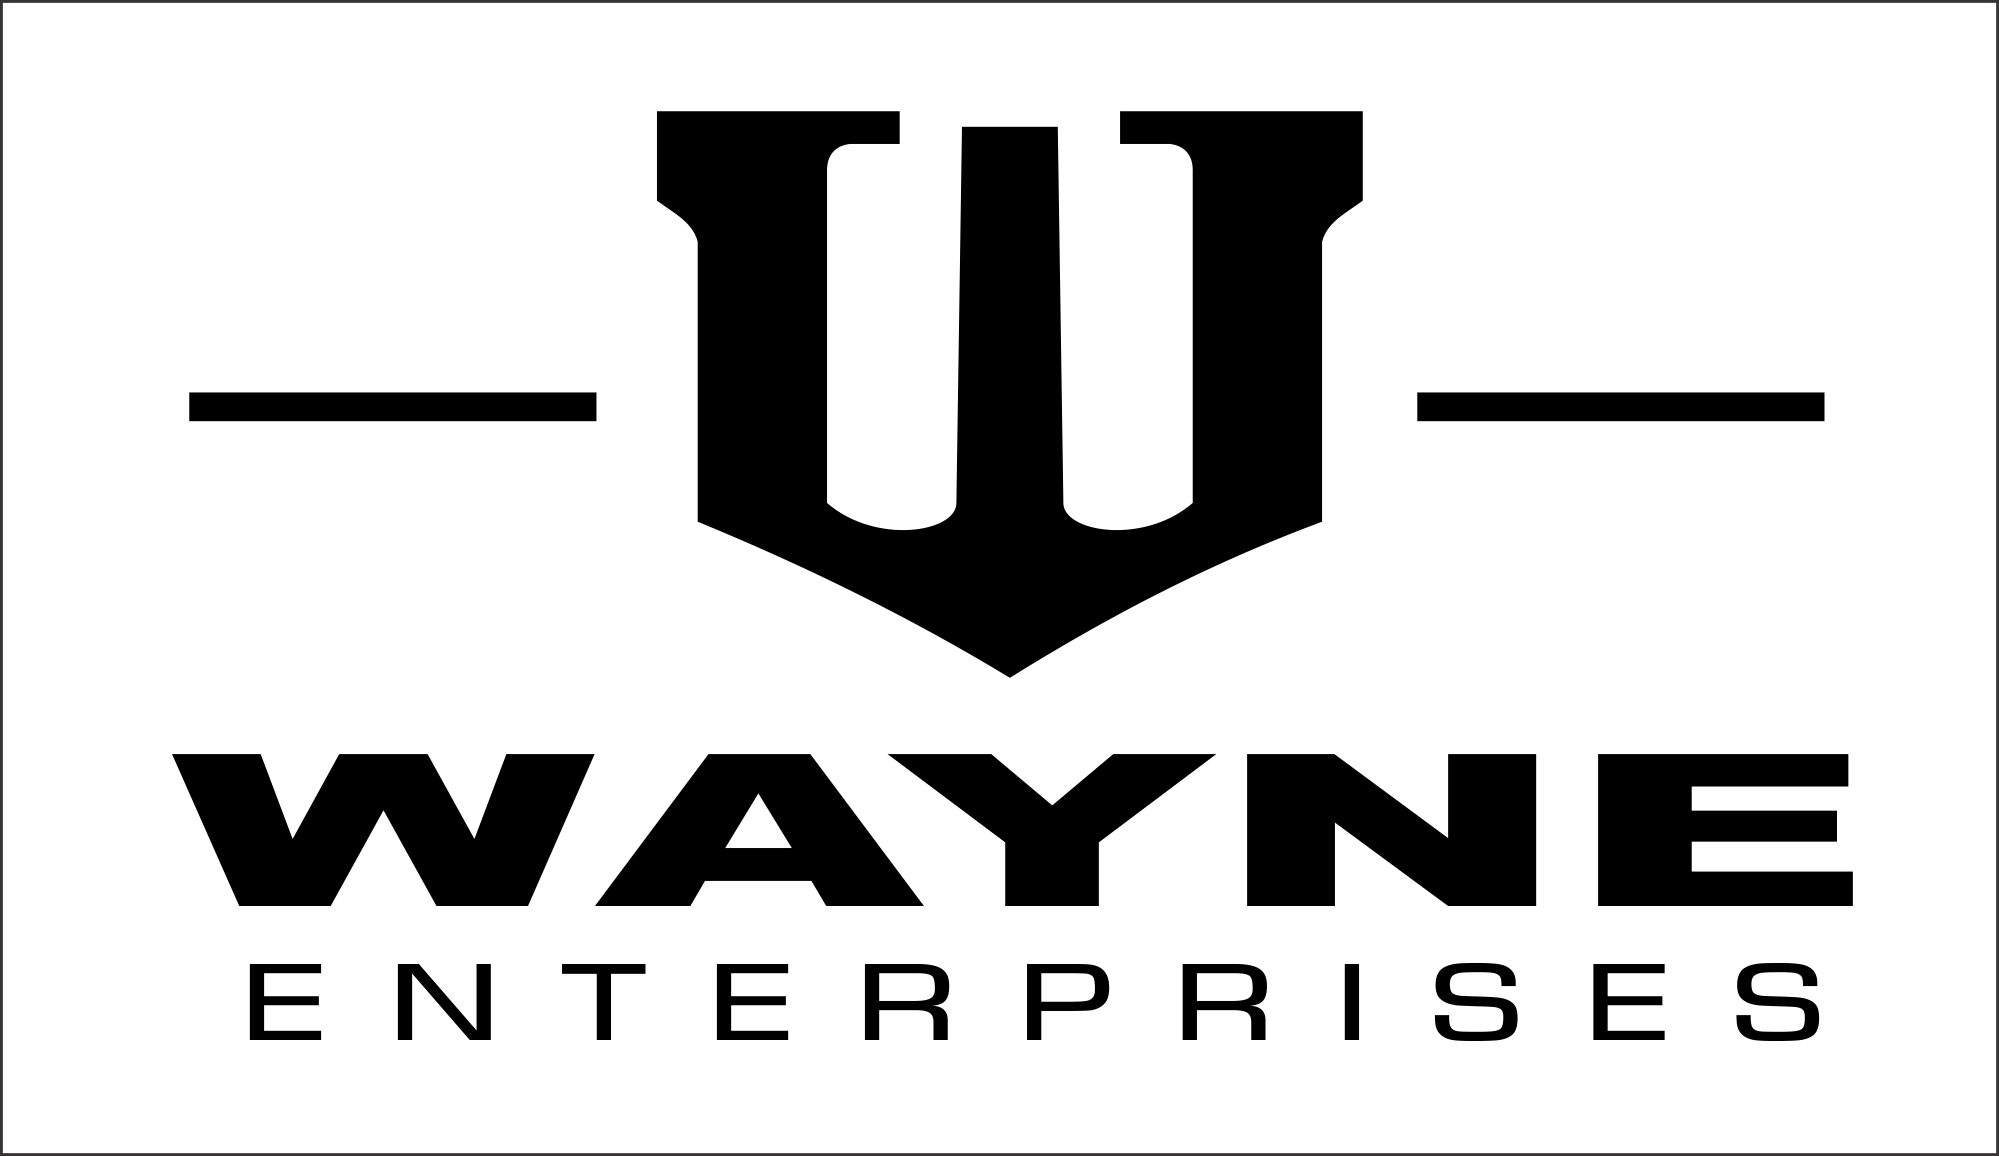 Wayne-enterprises-logo.png